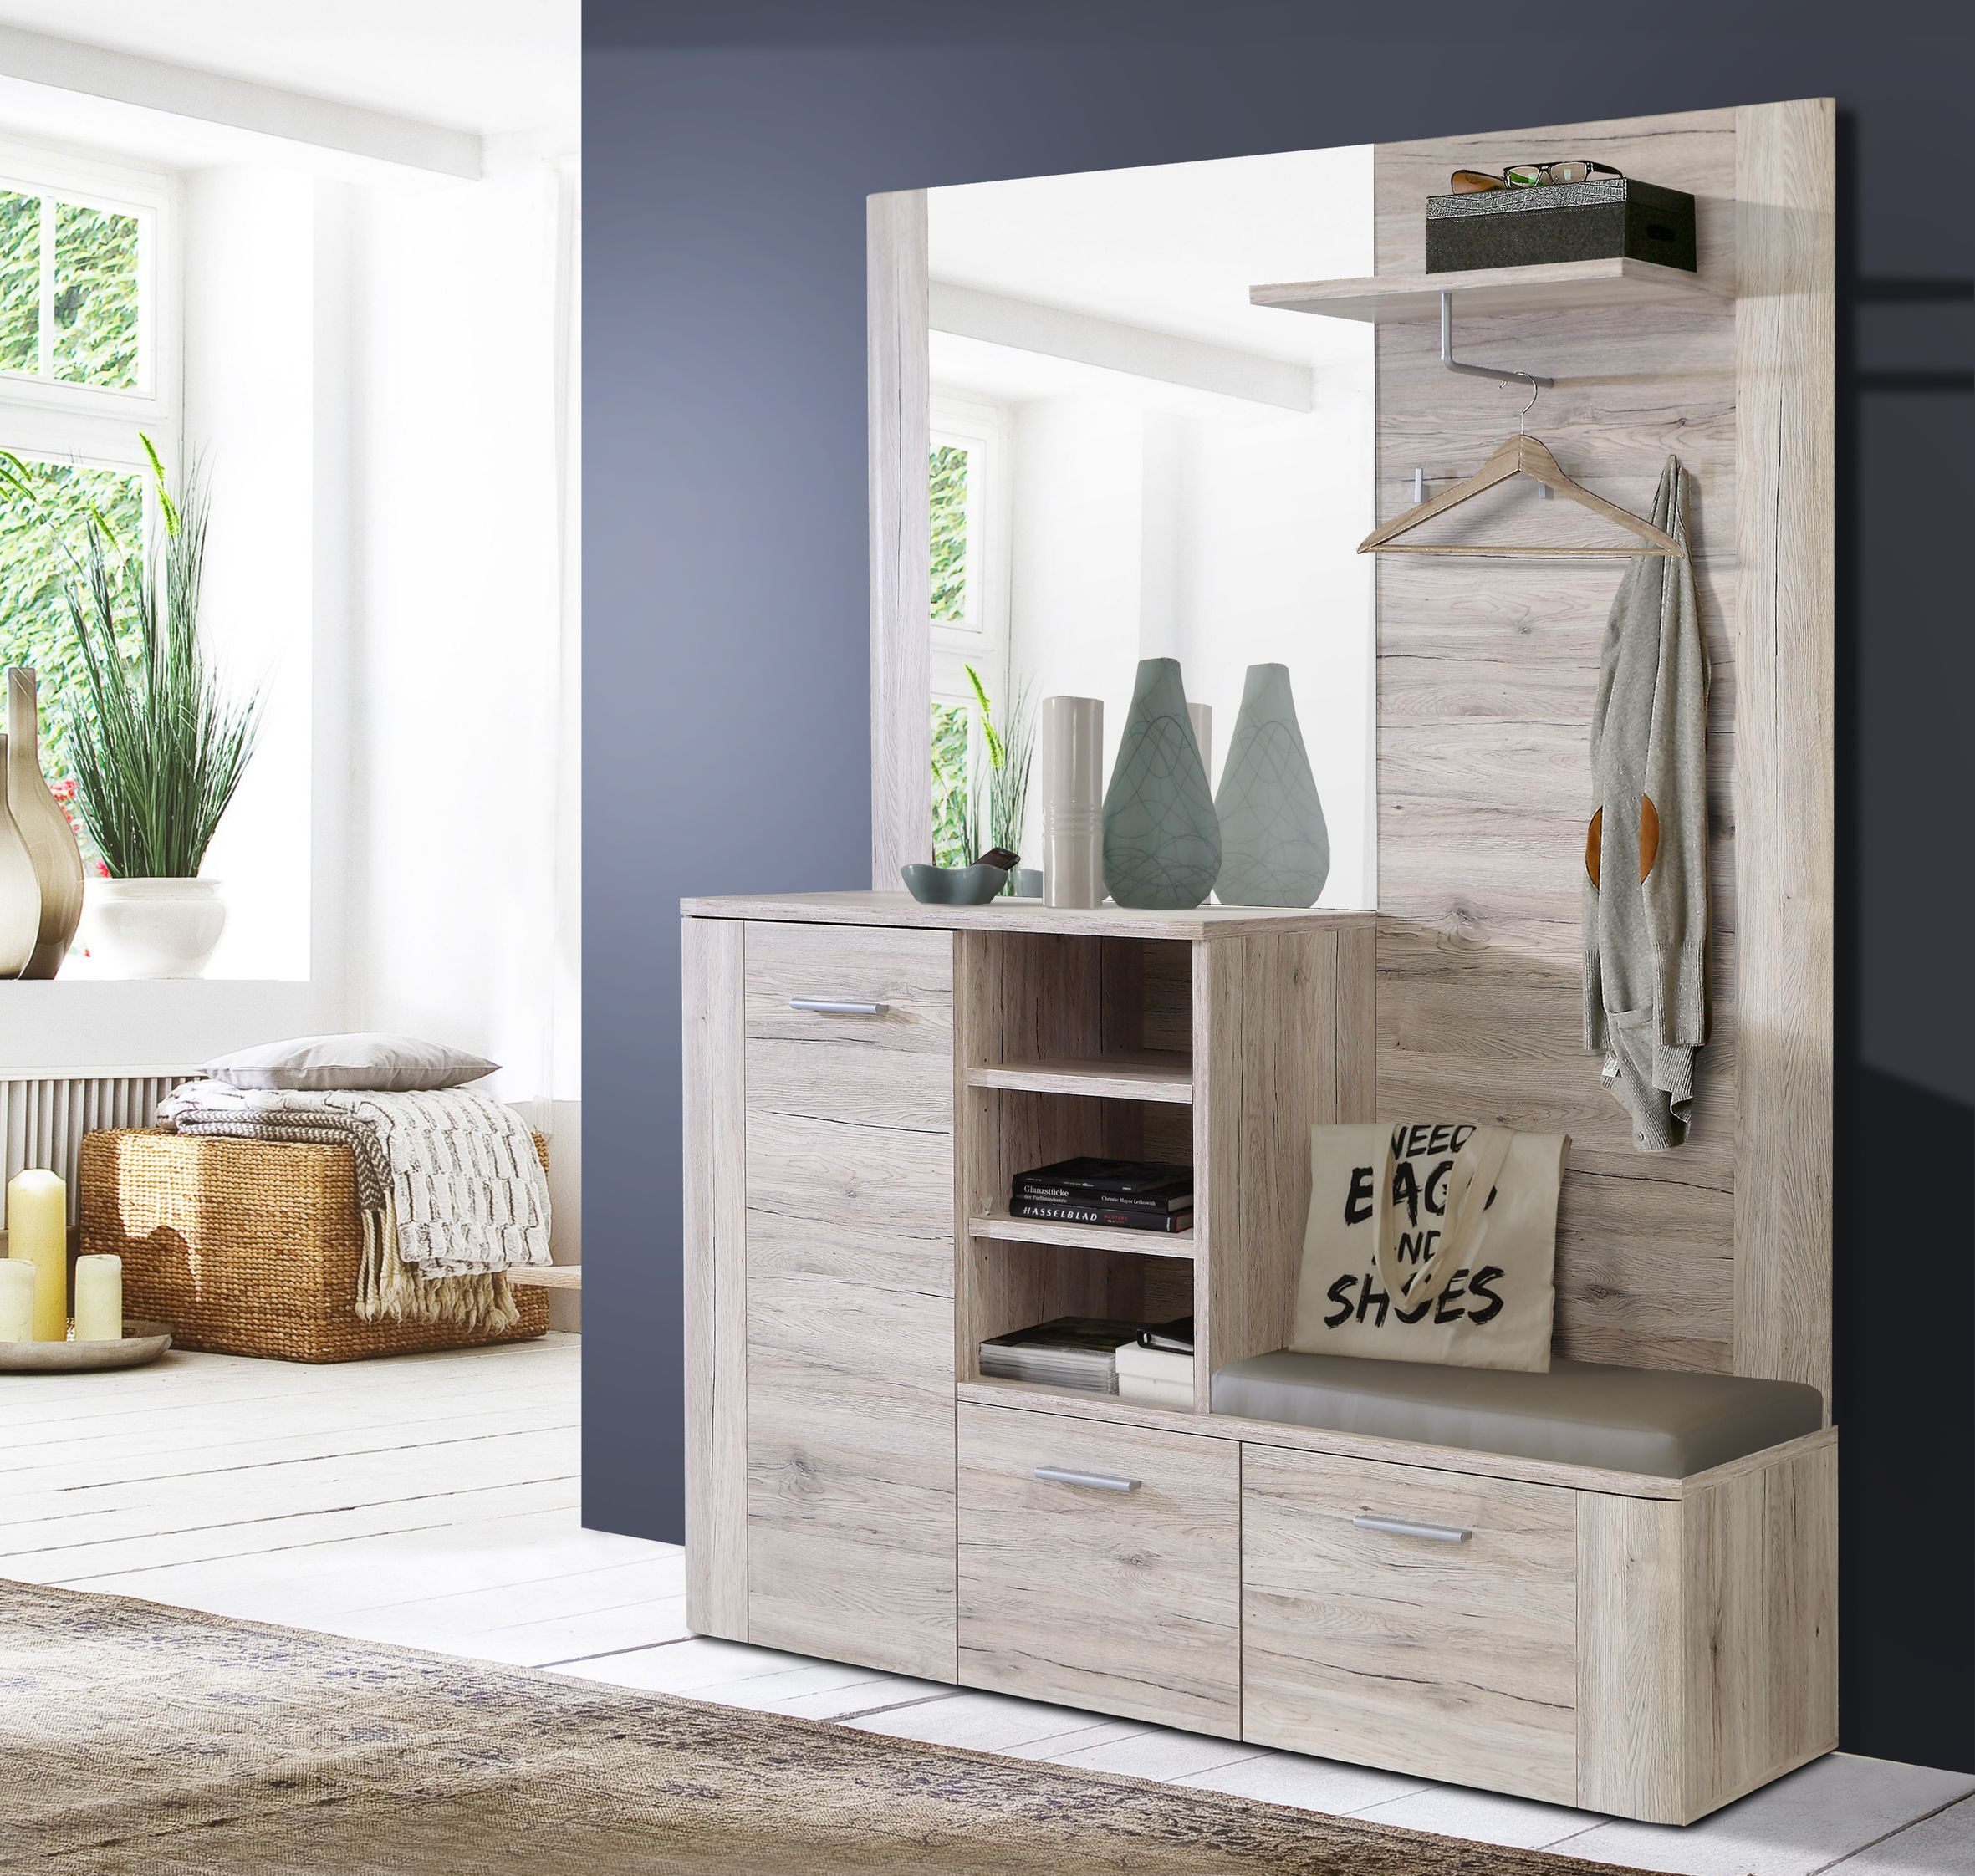 garderobe kompakt big bang von forte sandeiche. Black Bedroom Furniture Sets. Home Design Ideas